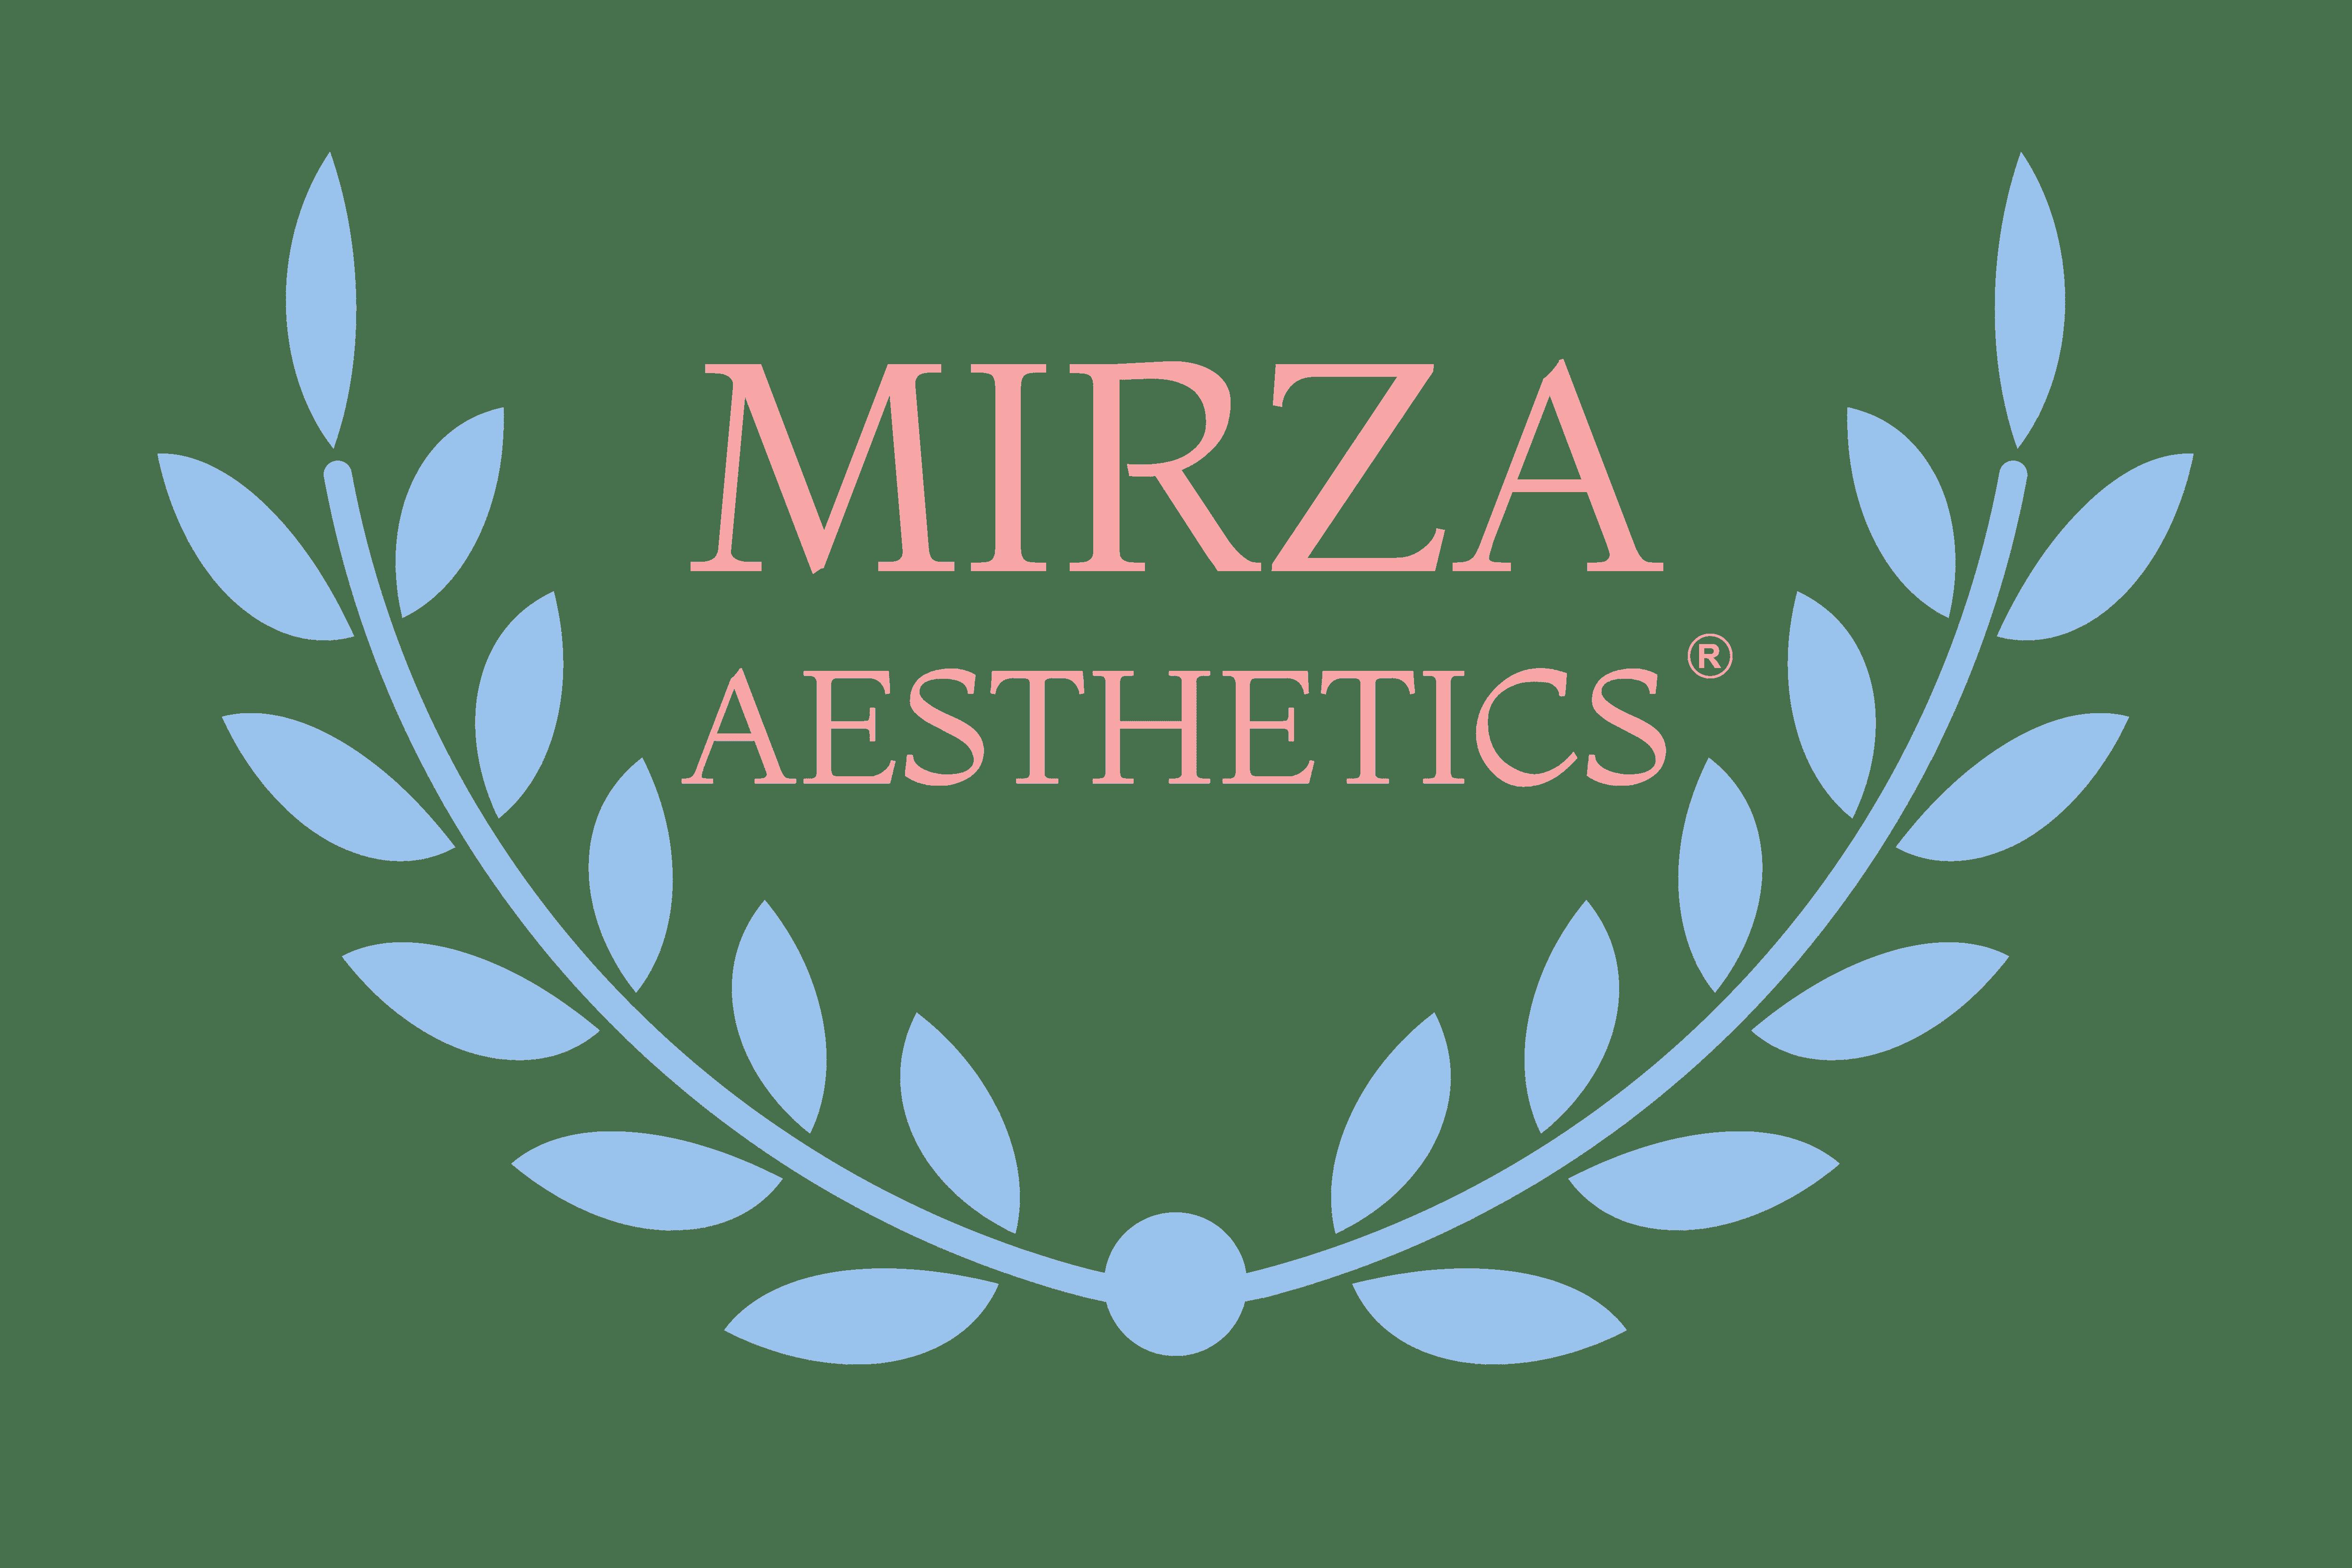 Mirza Aesthetics®